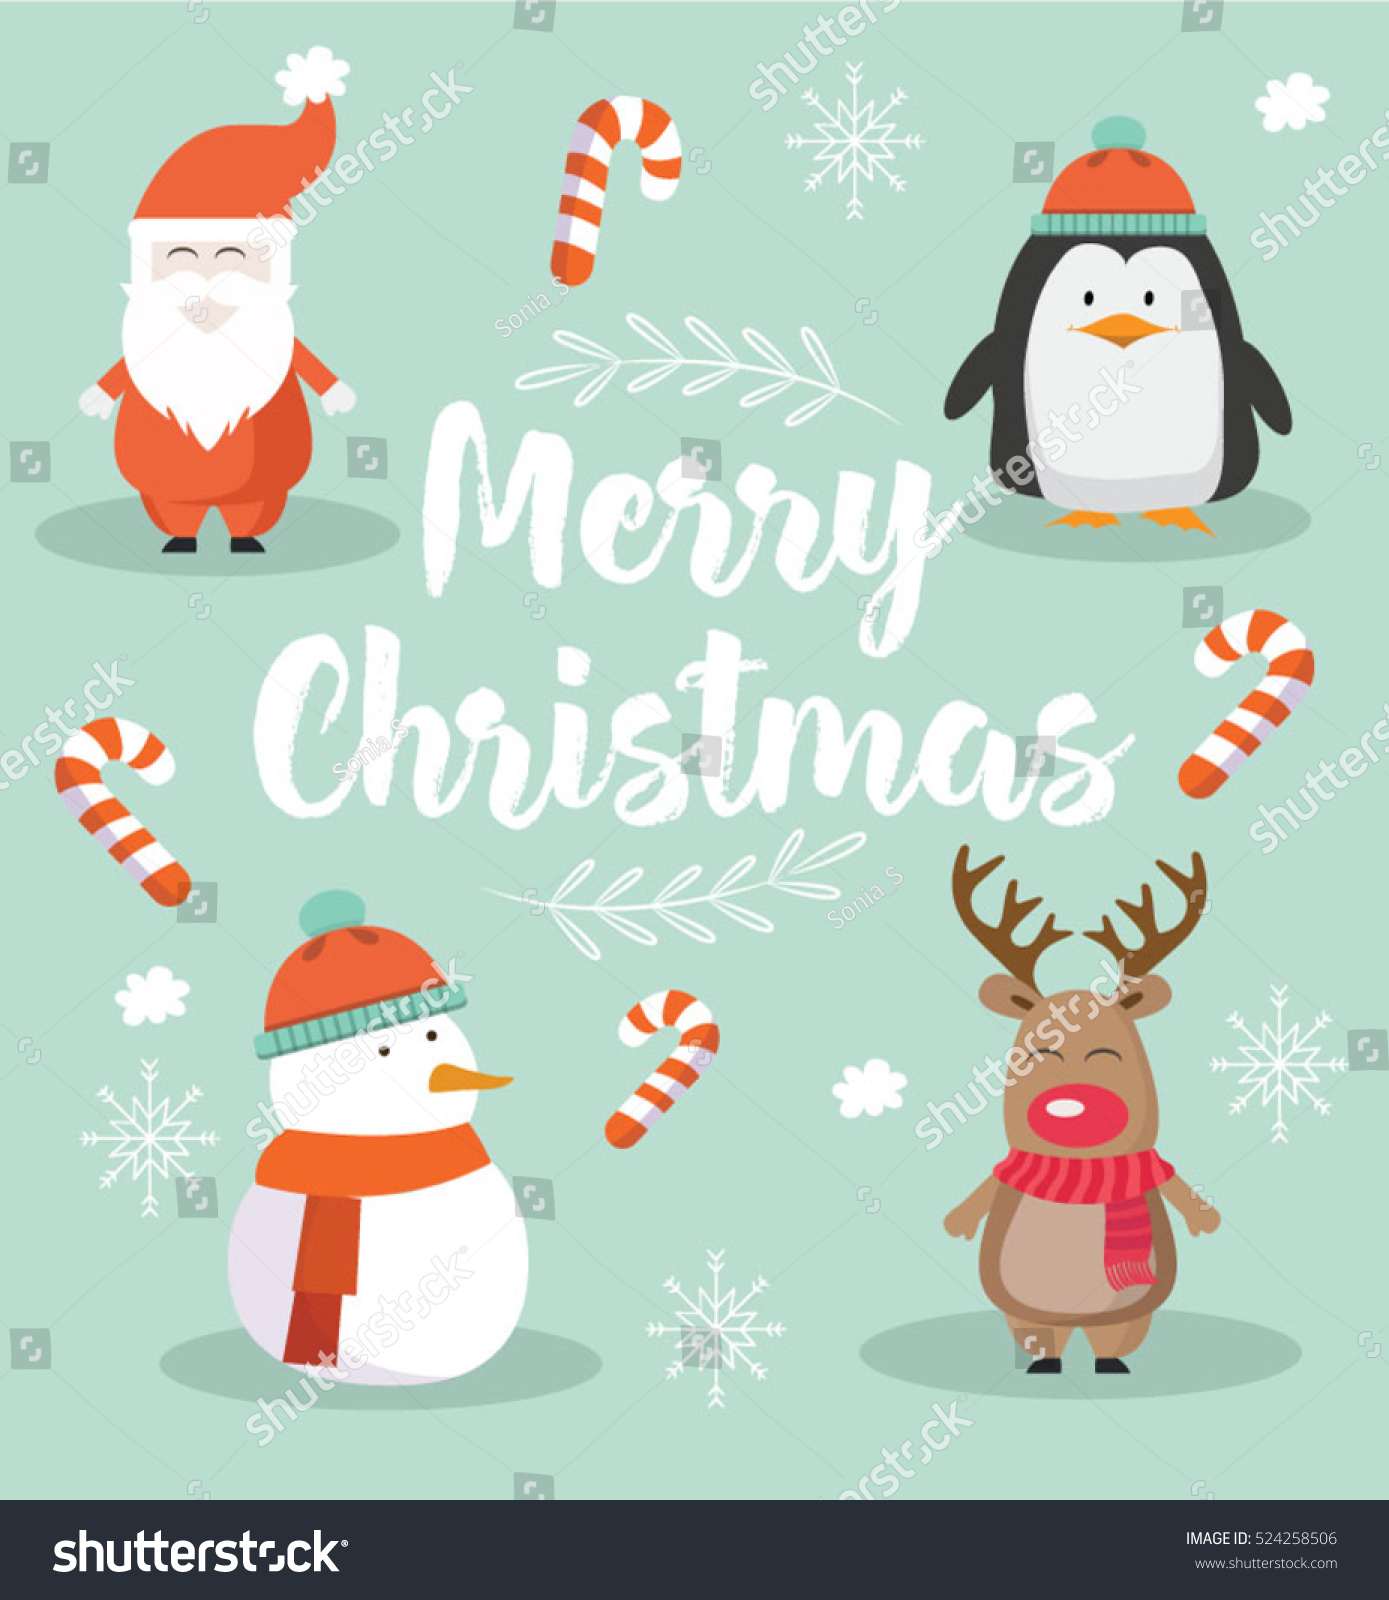 merry christmas cute modern card with santa penguin snowman and deer